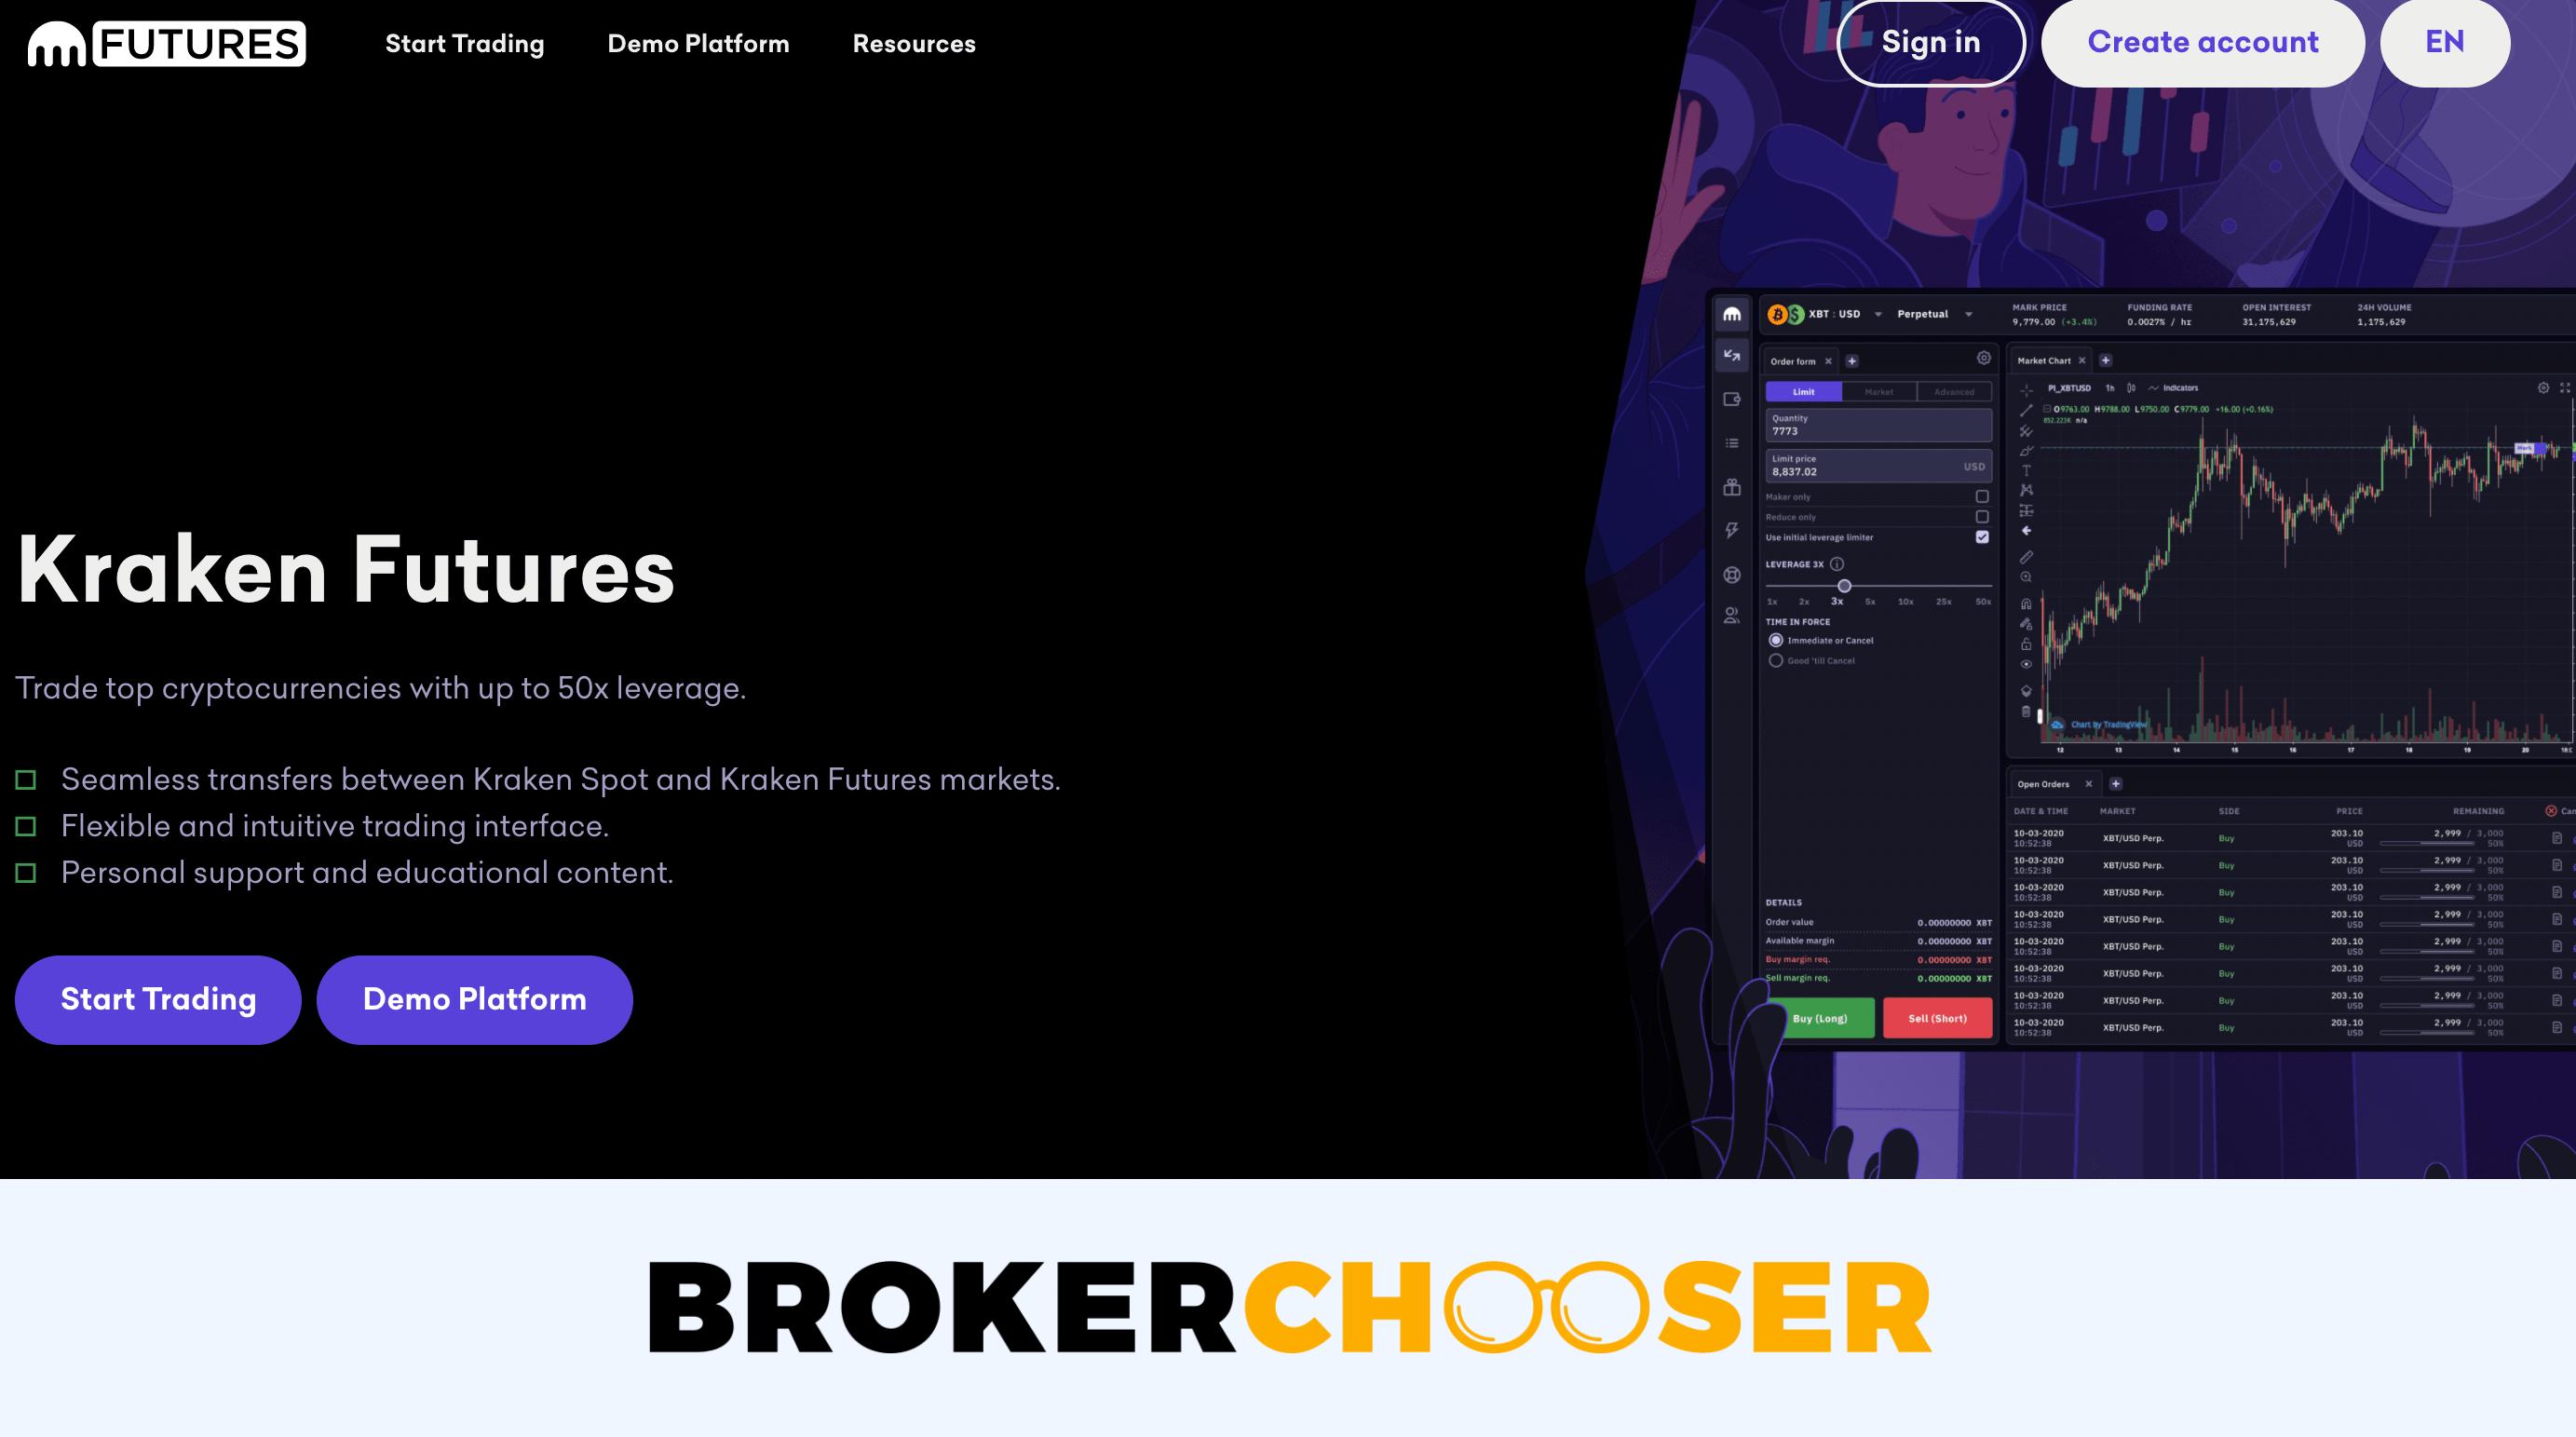 Kraken review - Product selection - Futures trading platform